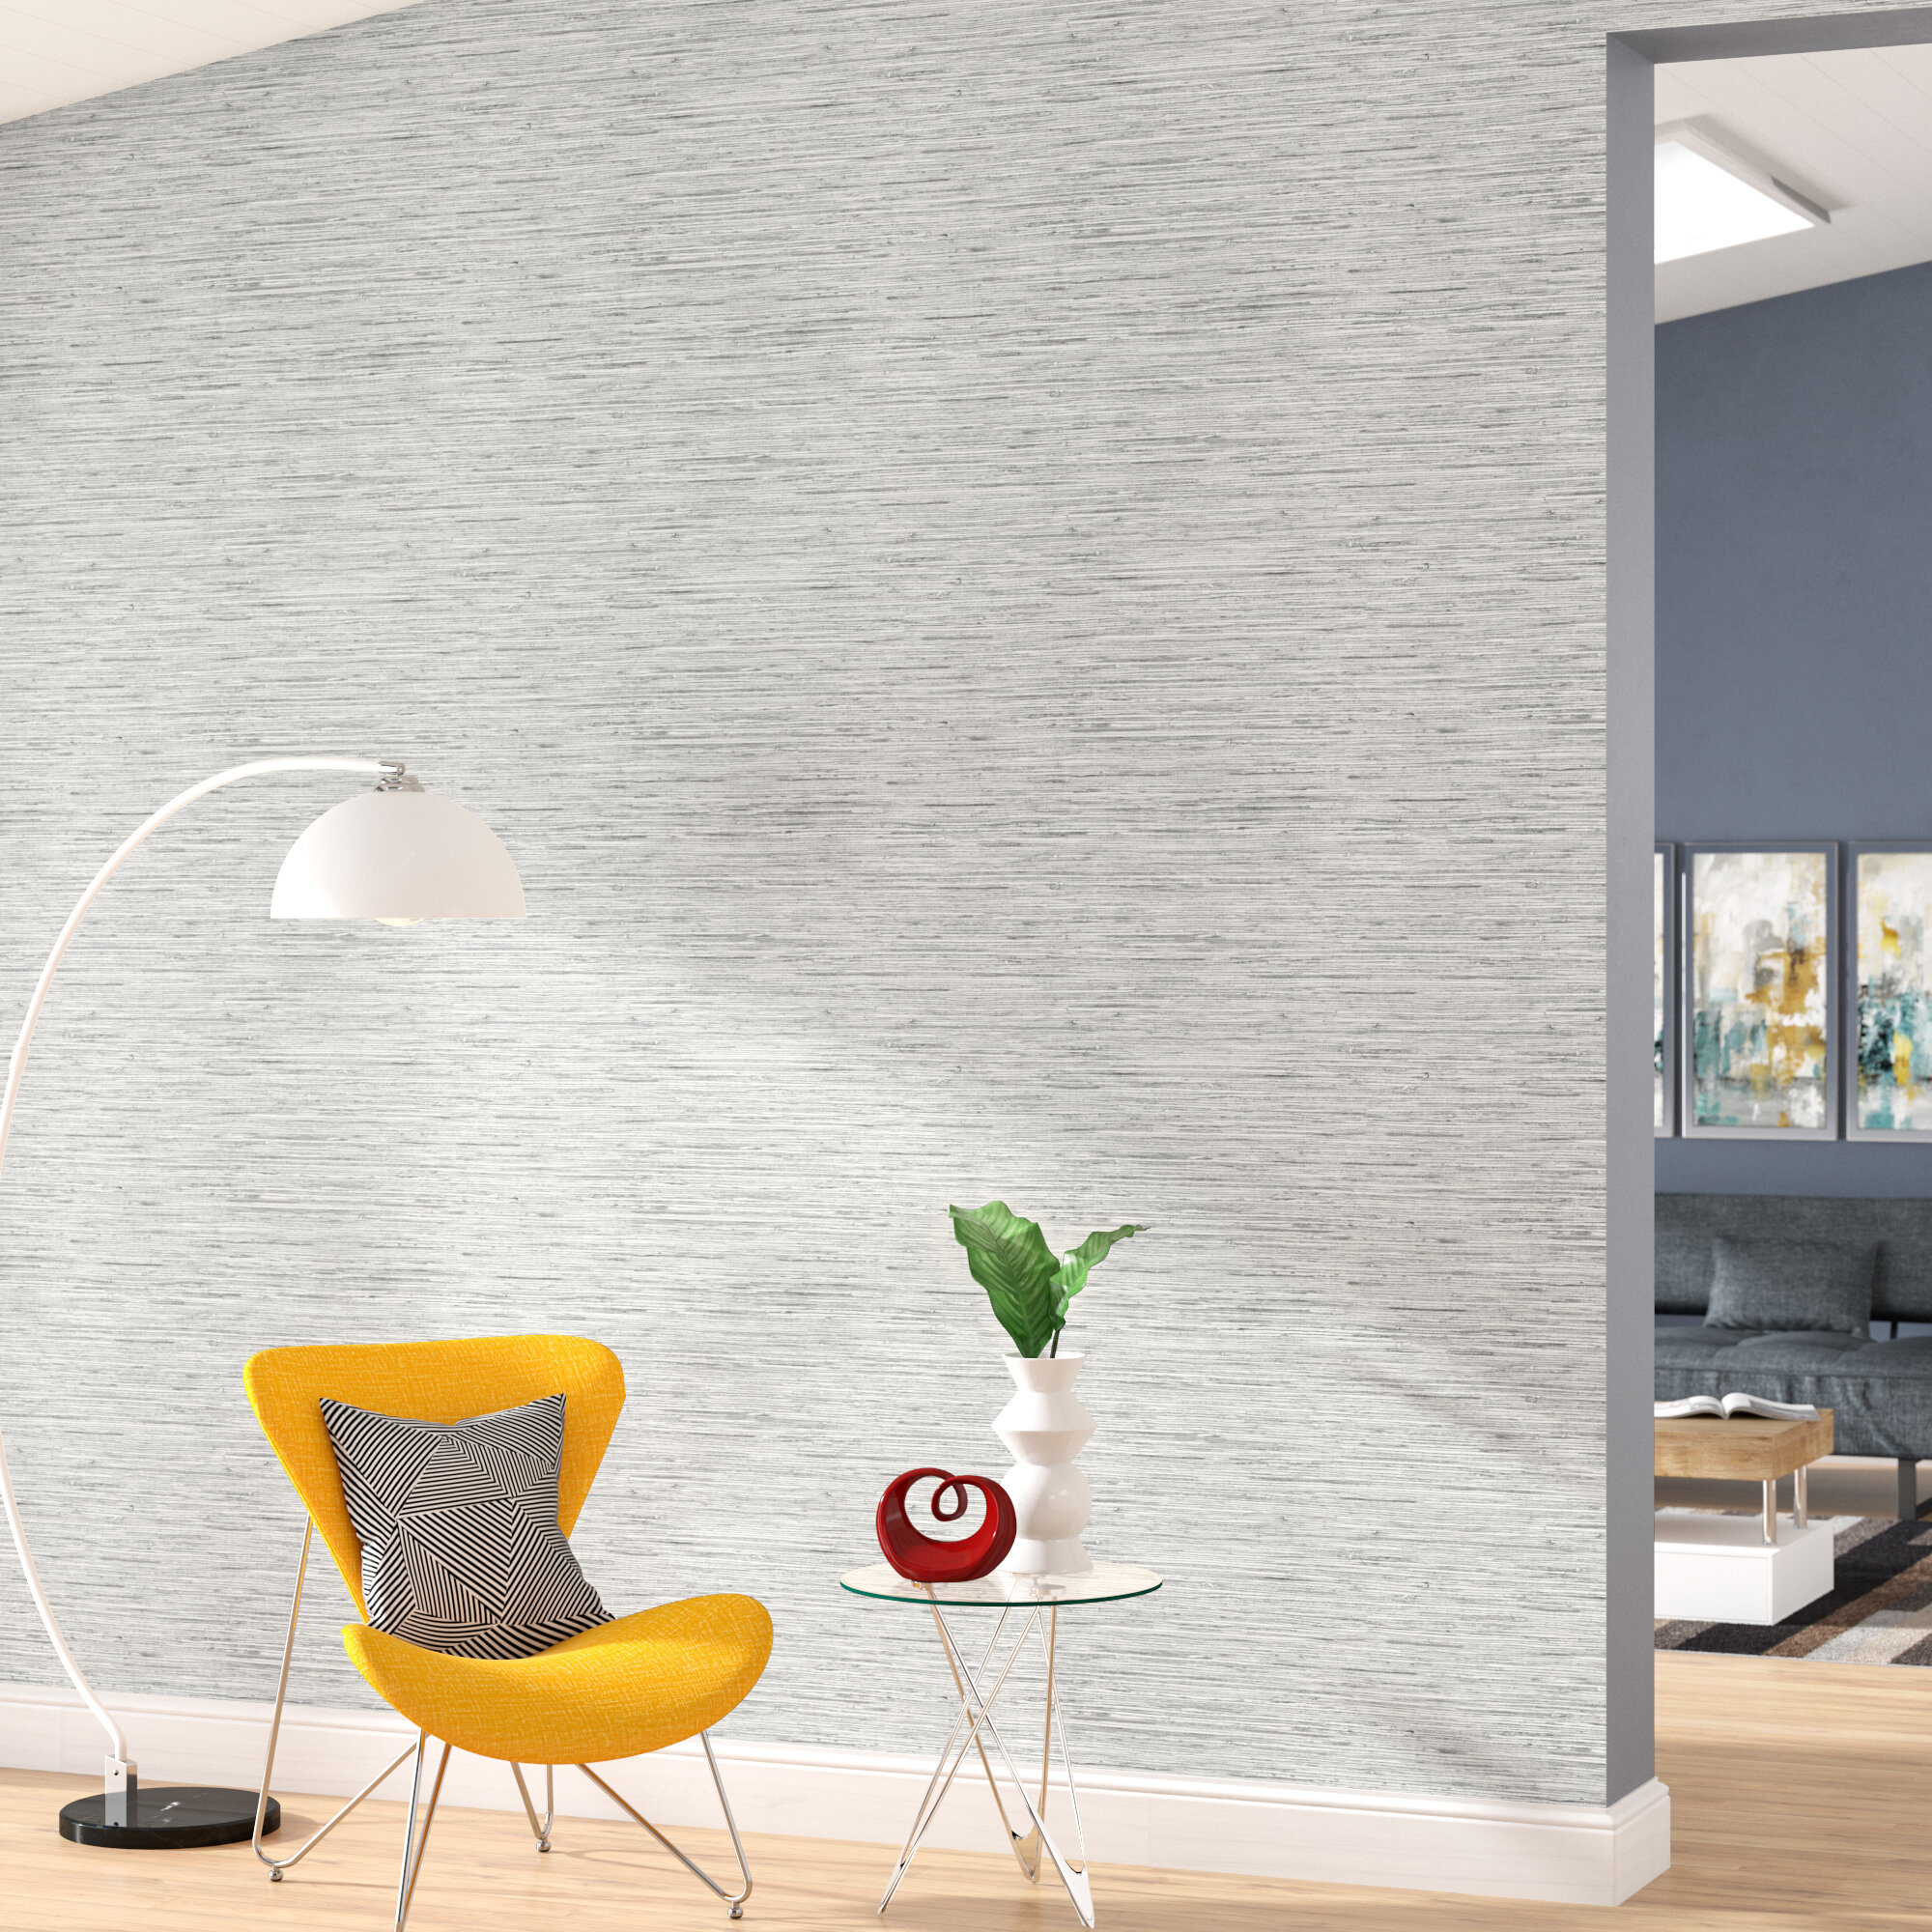 Modern Contemporary Self Adhesive Wallpaper You Ll Love In 2020 Wayfair